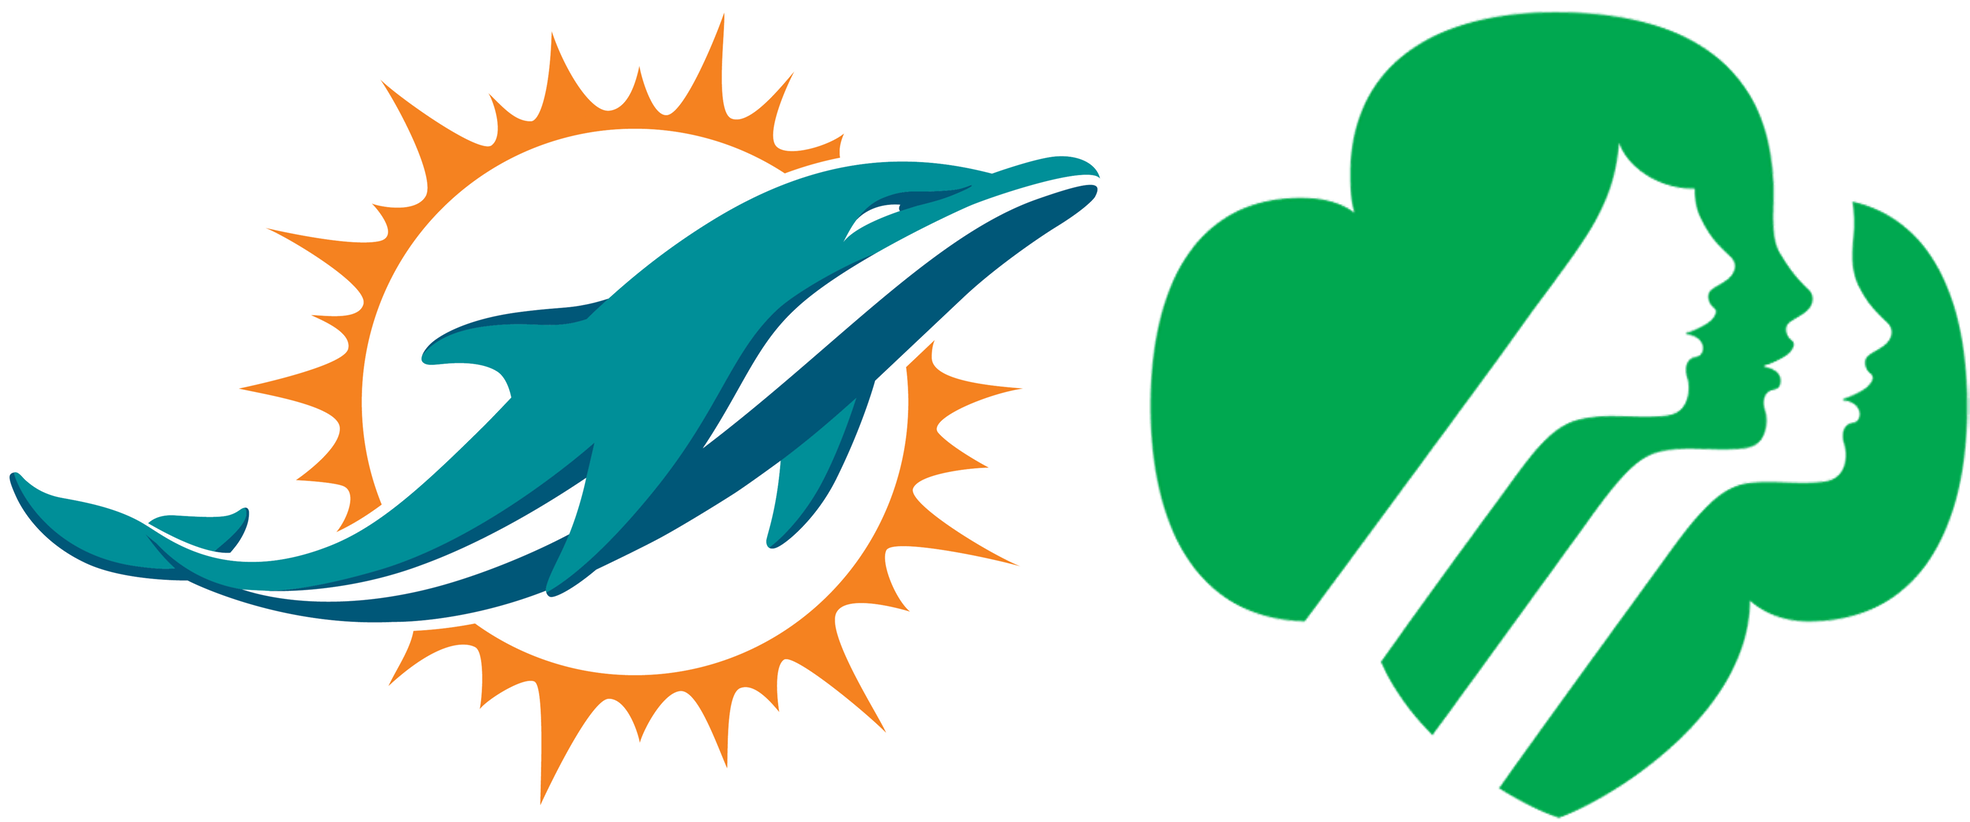 Dolphins vs tennessee titans. Clipart dolphin dolphin miami logo